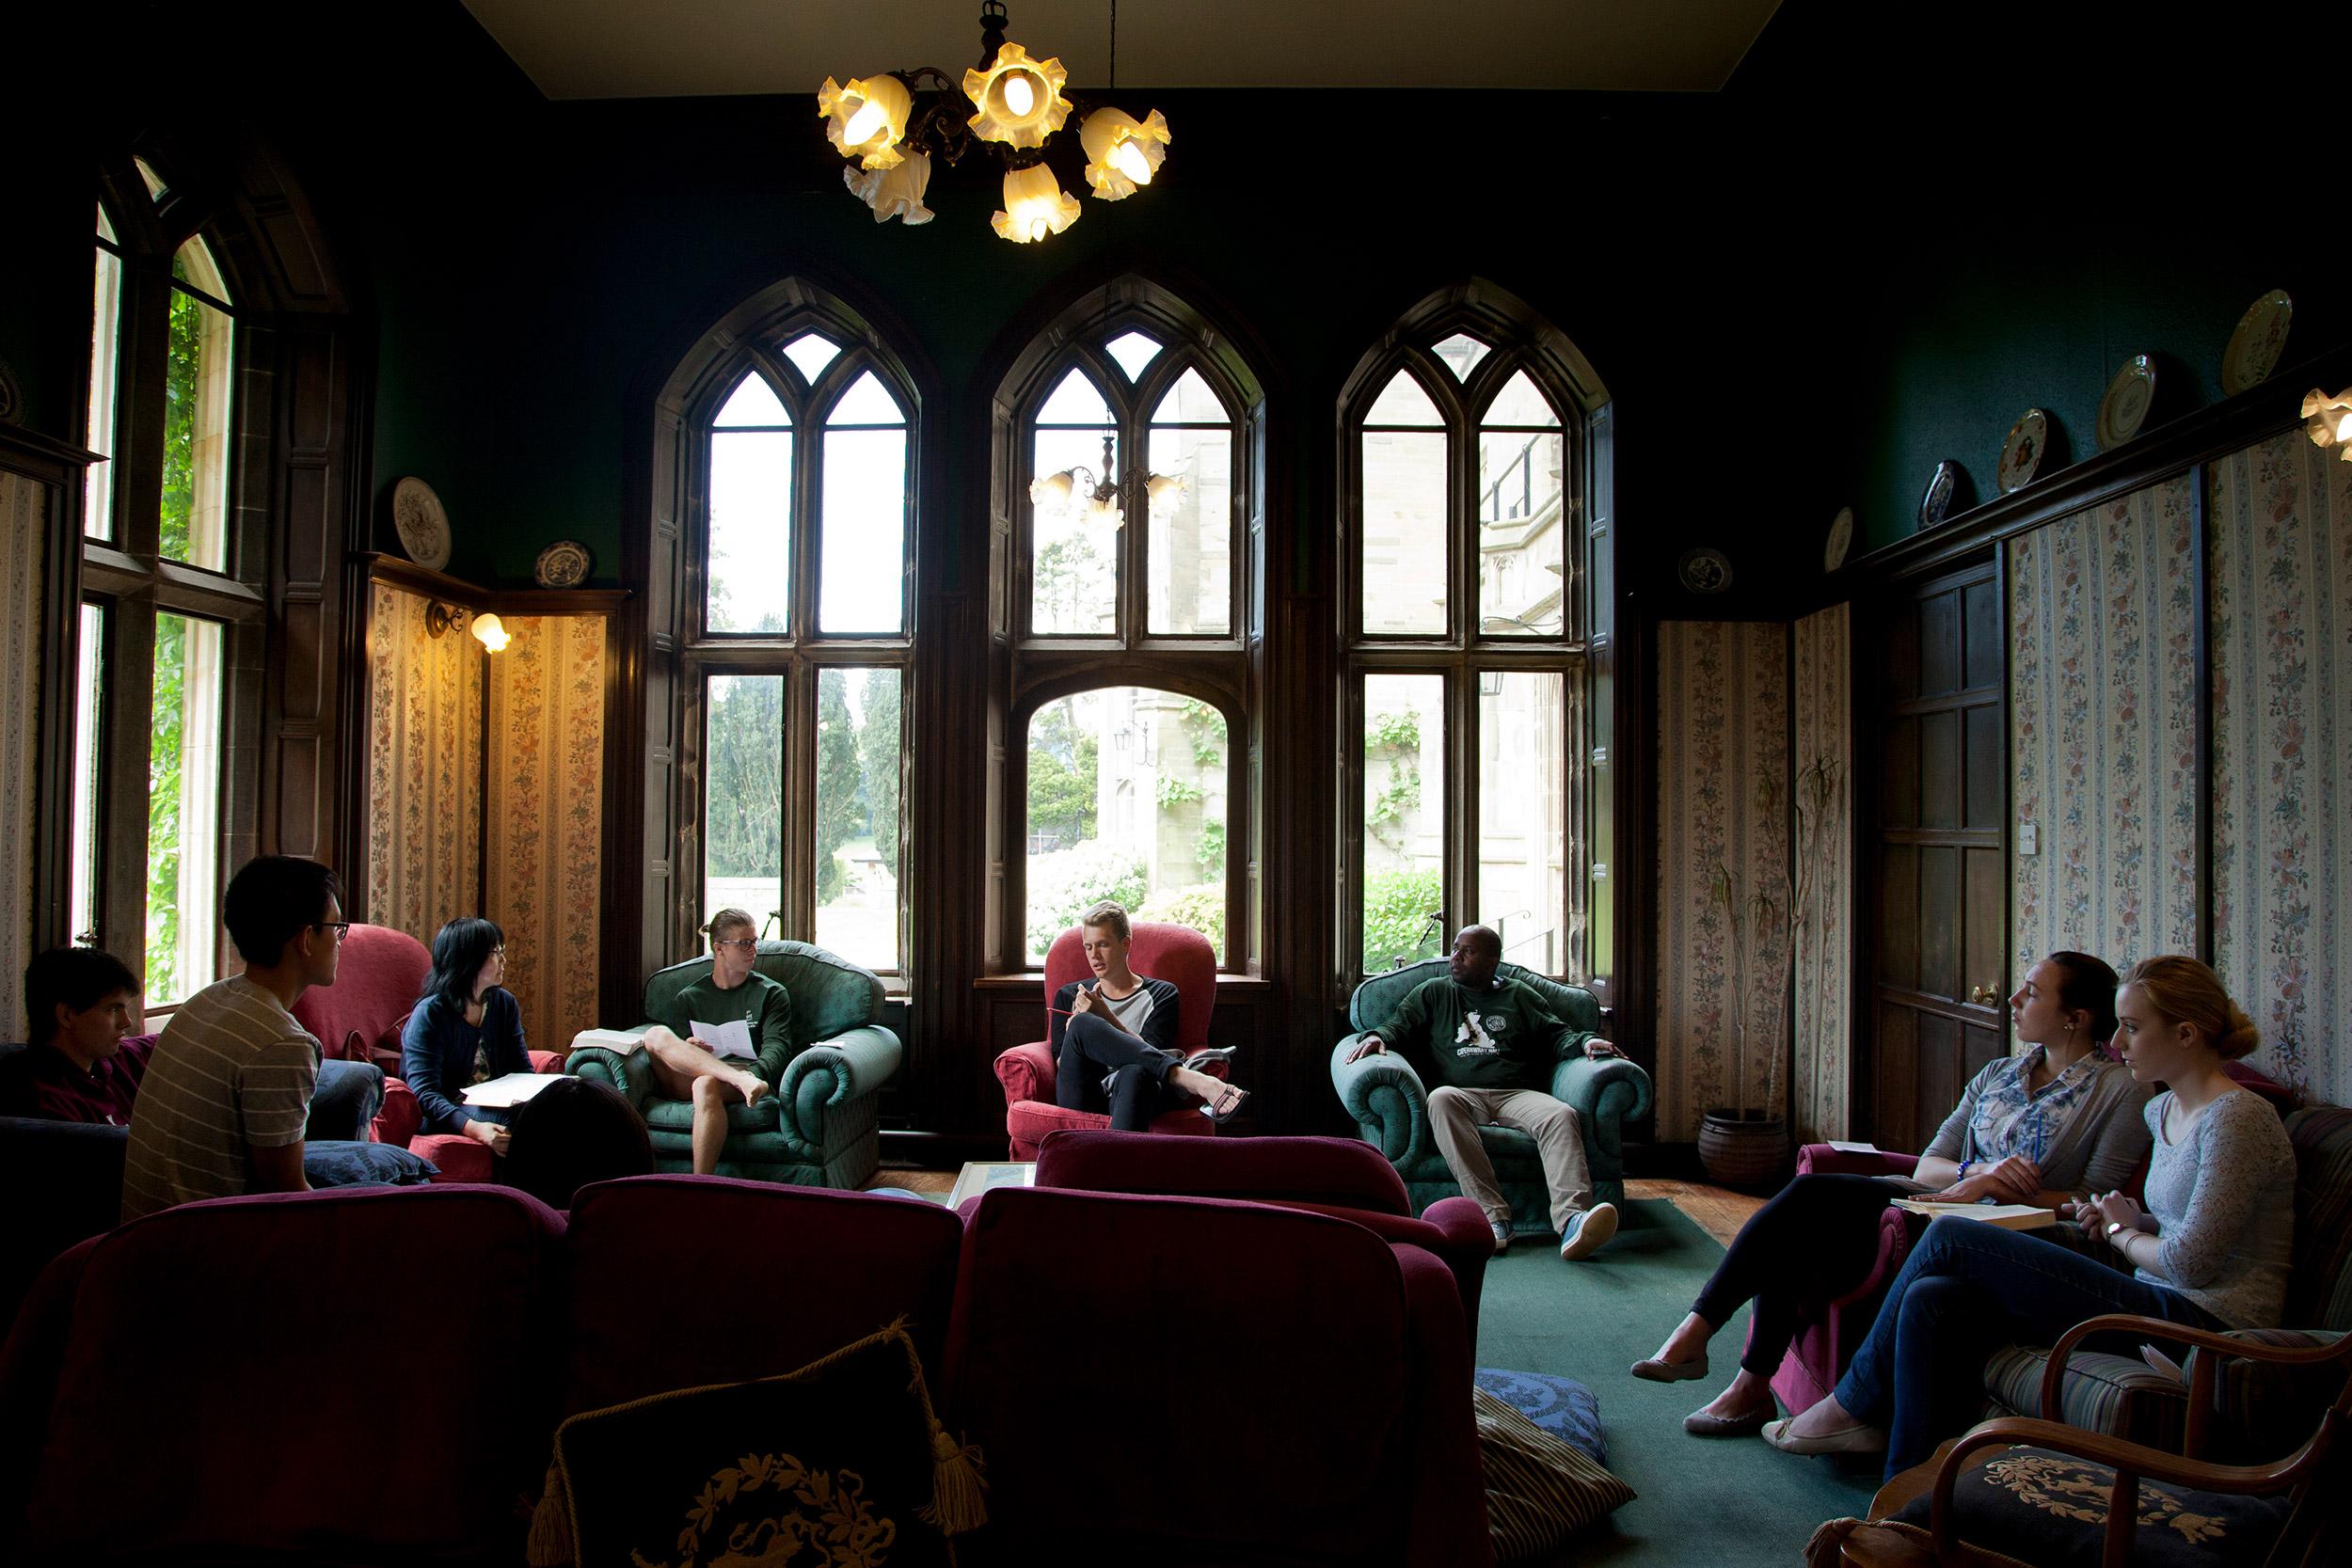 England - Capernwray Hall - Torchbearers International